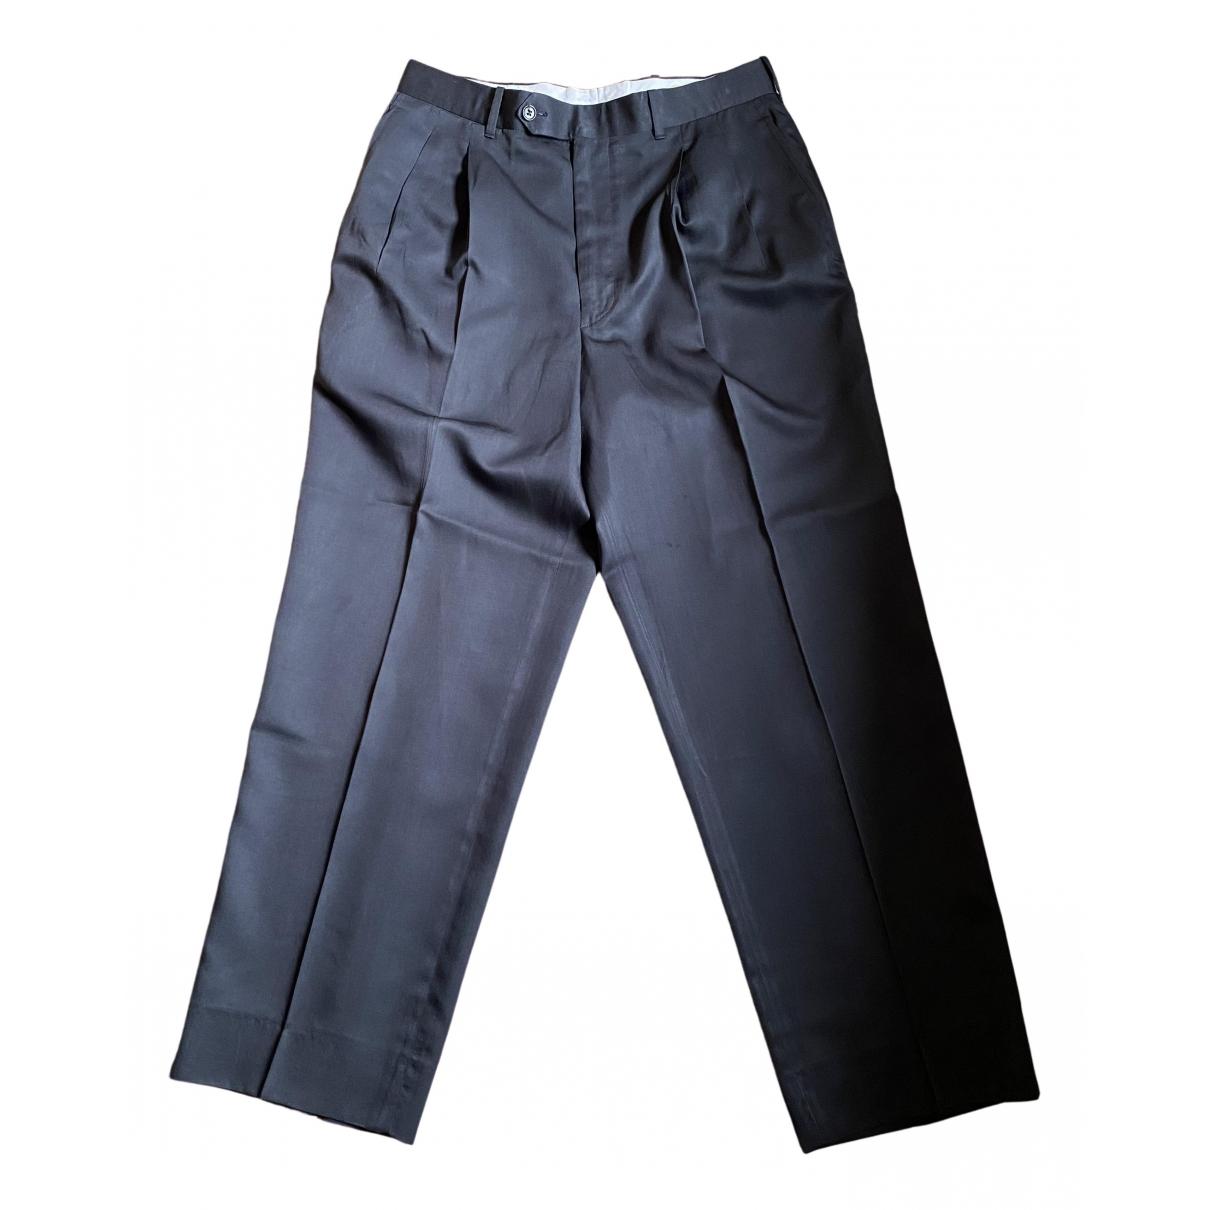 Valentino Garavani N Grey Cotton Trousers for Men 46